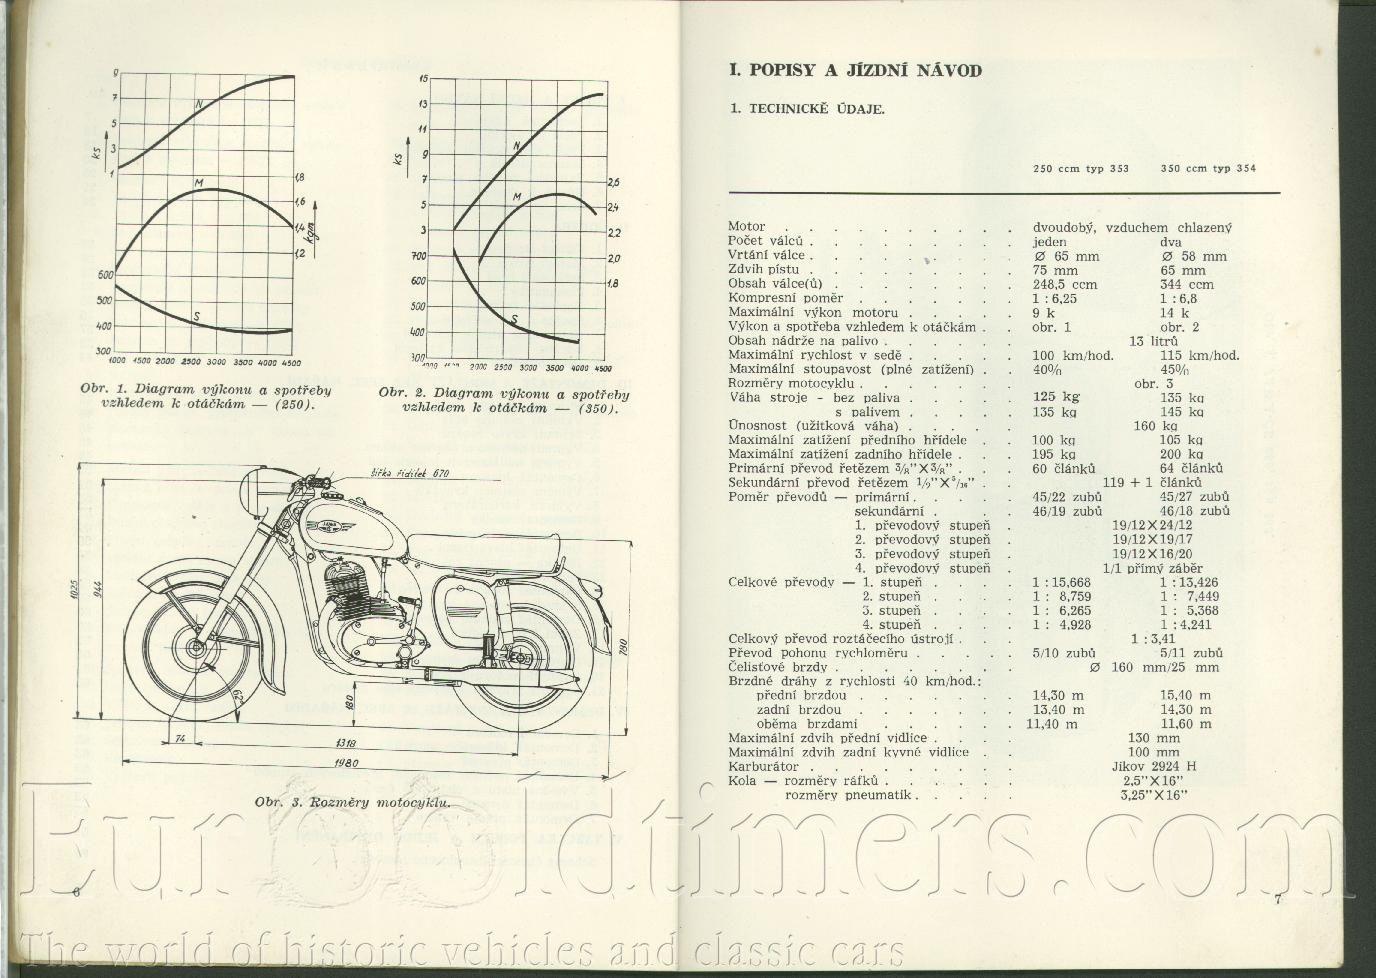 01a6458eae6d3e94735138d86e19a946 2130 best มอเตอร์ไซค์ images on pinterest biking, mopeds and jawa 350 wiring diagram at alyssarenee.co